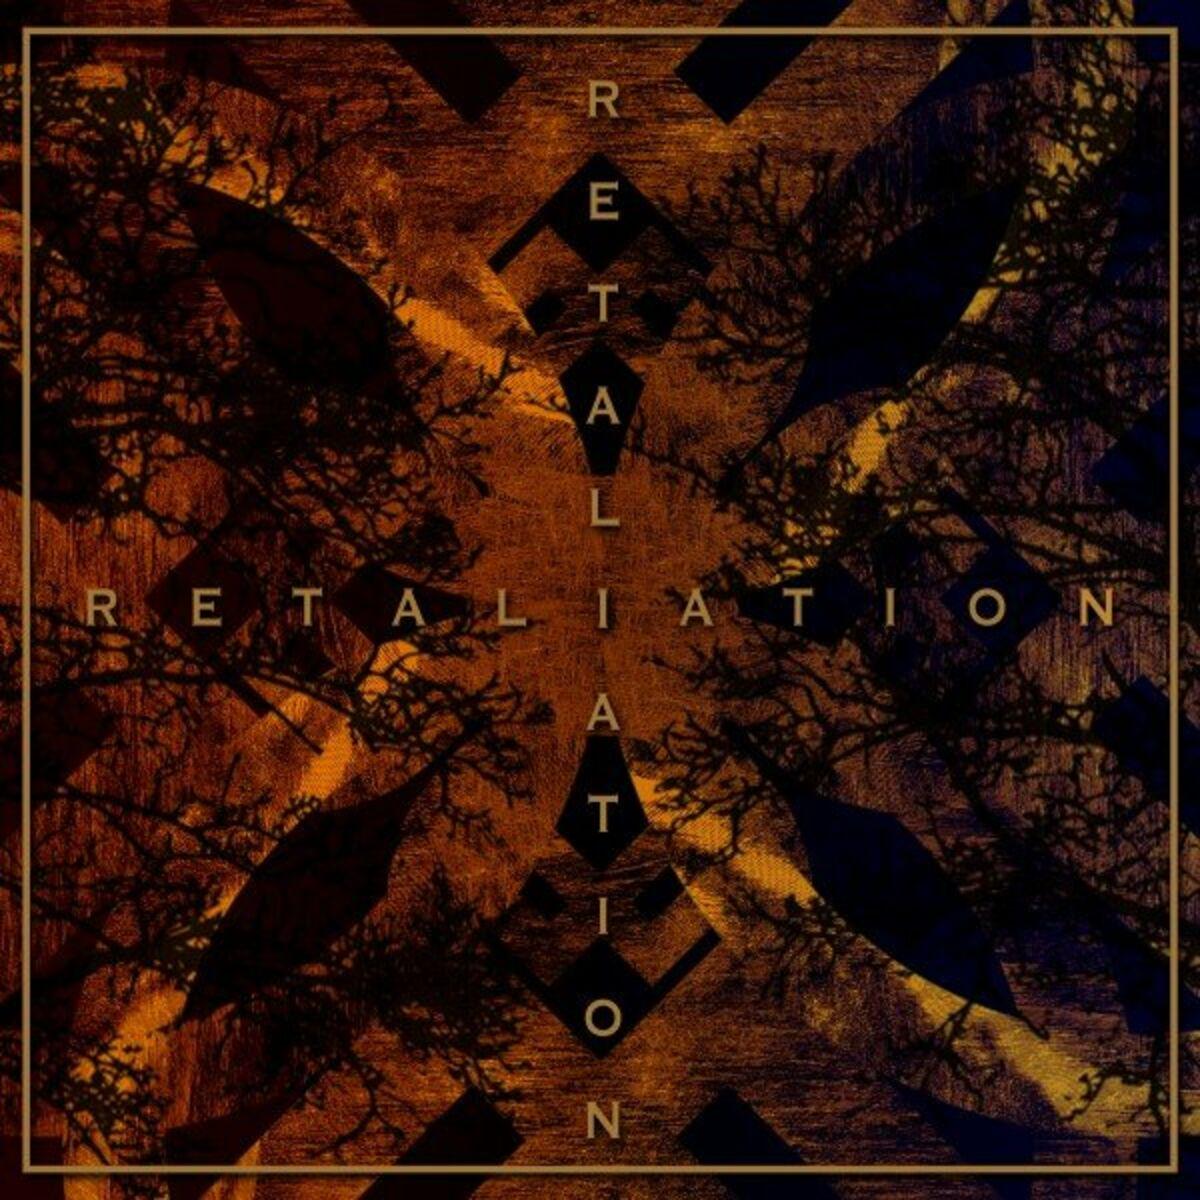 Aviana - Retaliation [single] (2021)